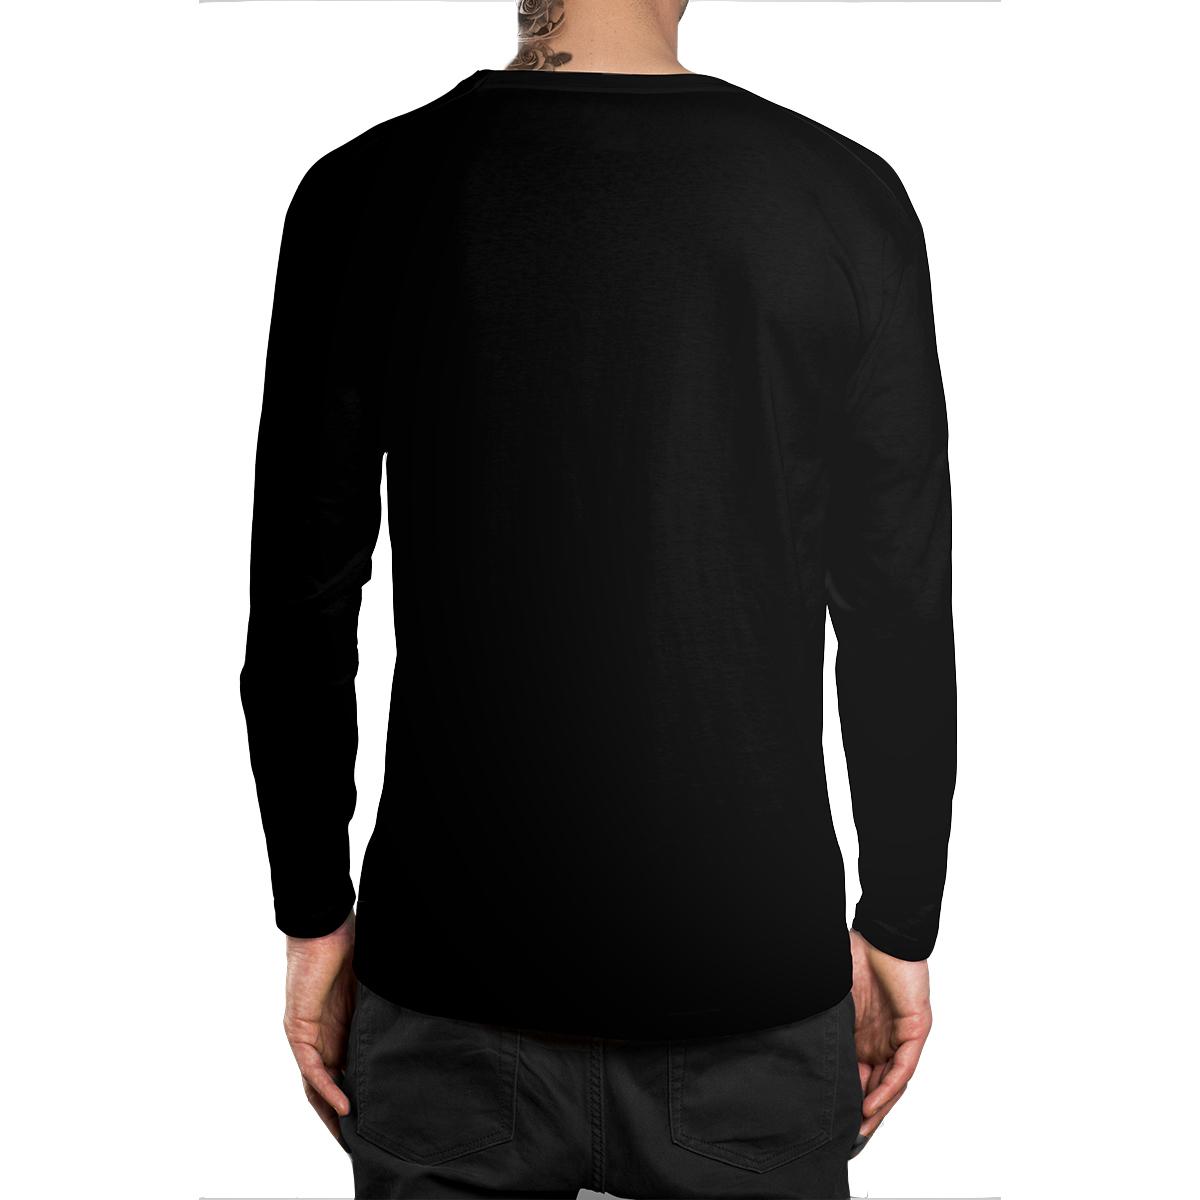 Stompy Camiseta Manga Longa Modelo 40